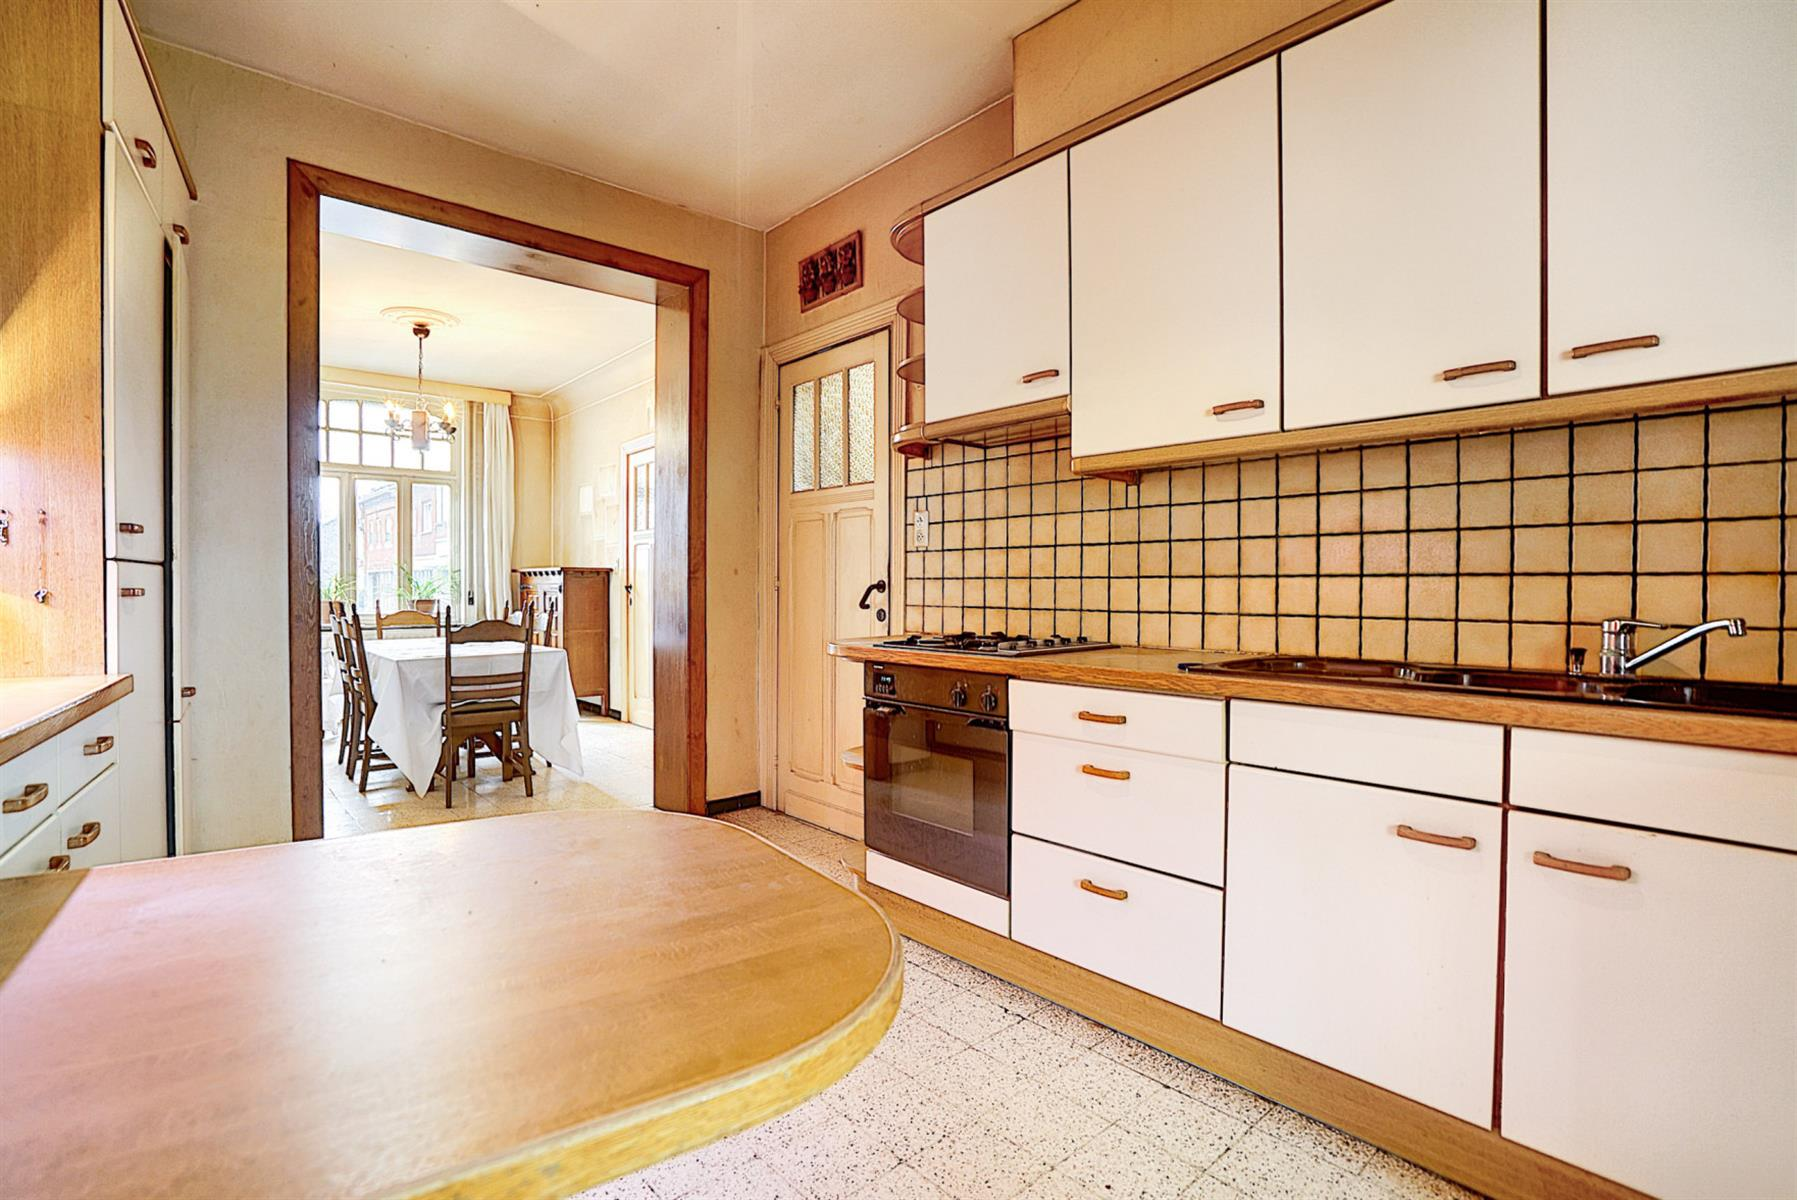 Maison - Ottignies-Louvain-la-Neuve - #4262981-4